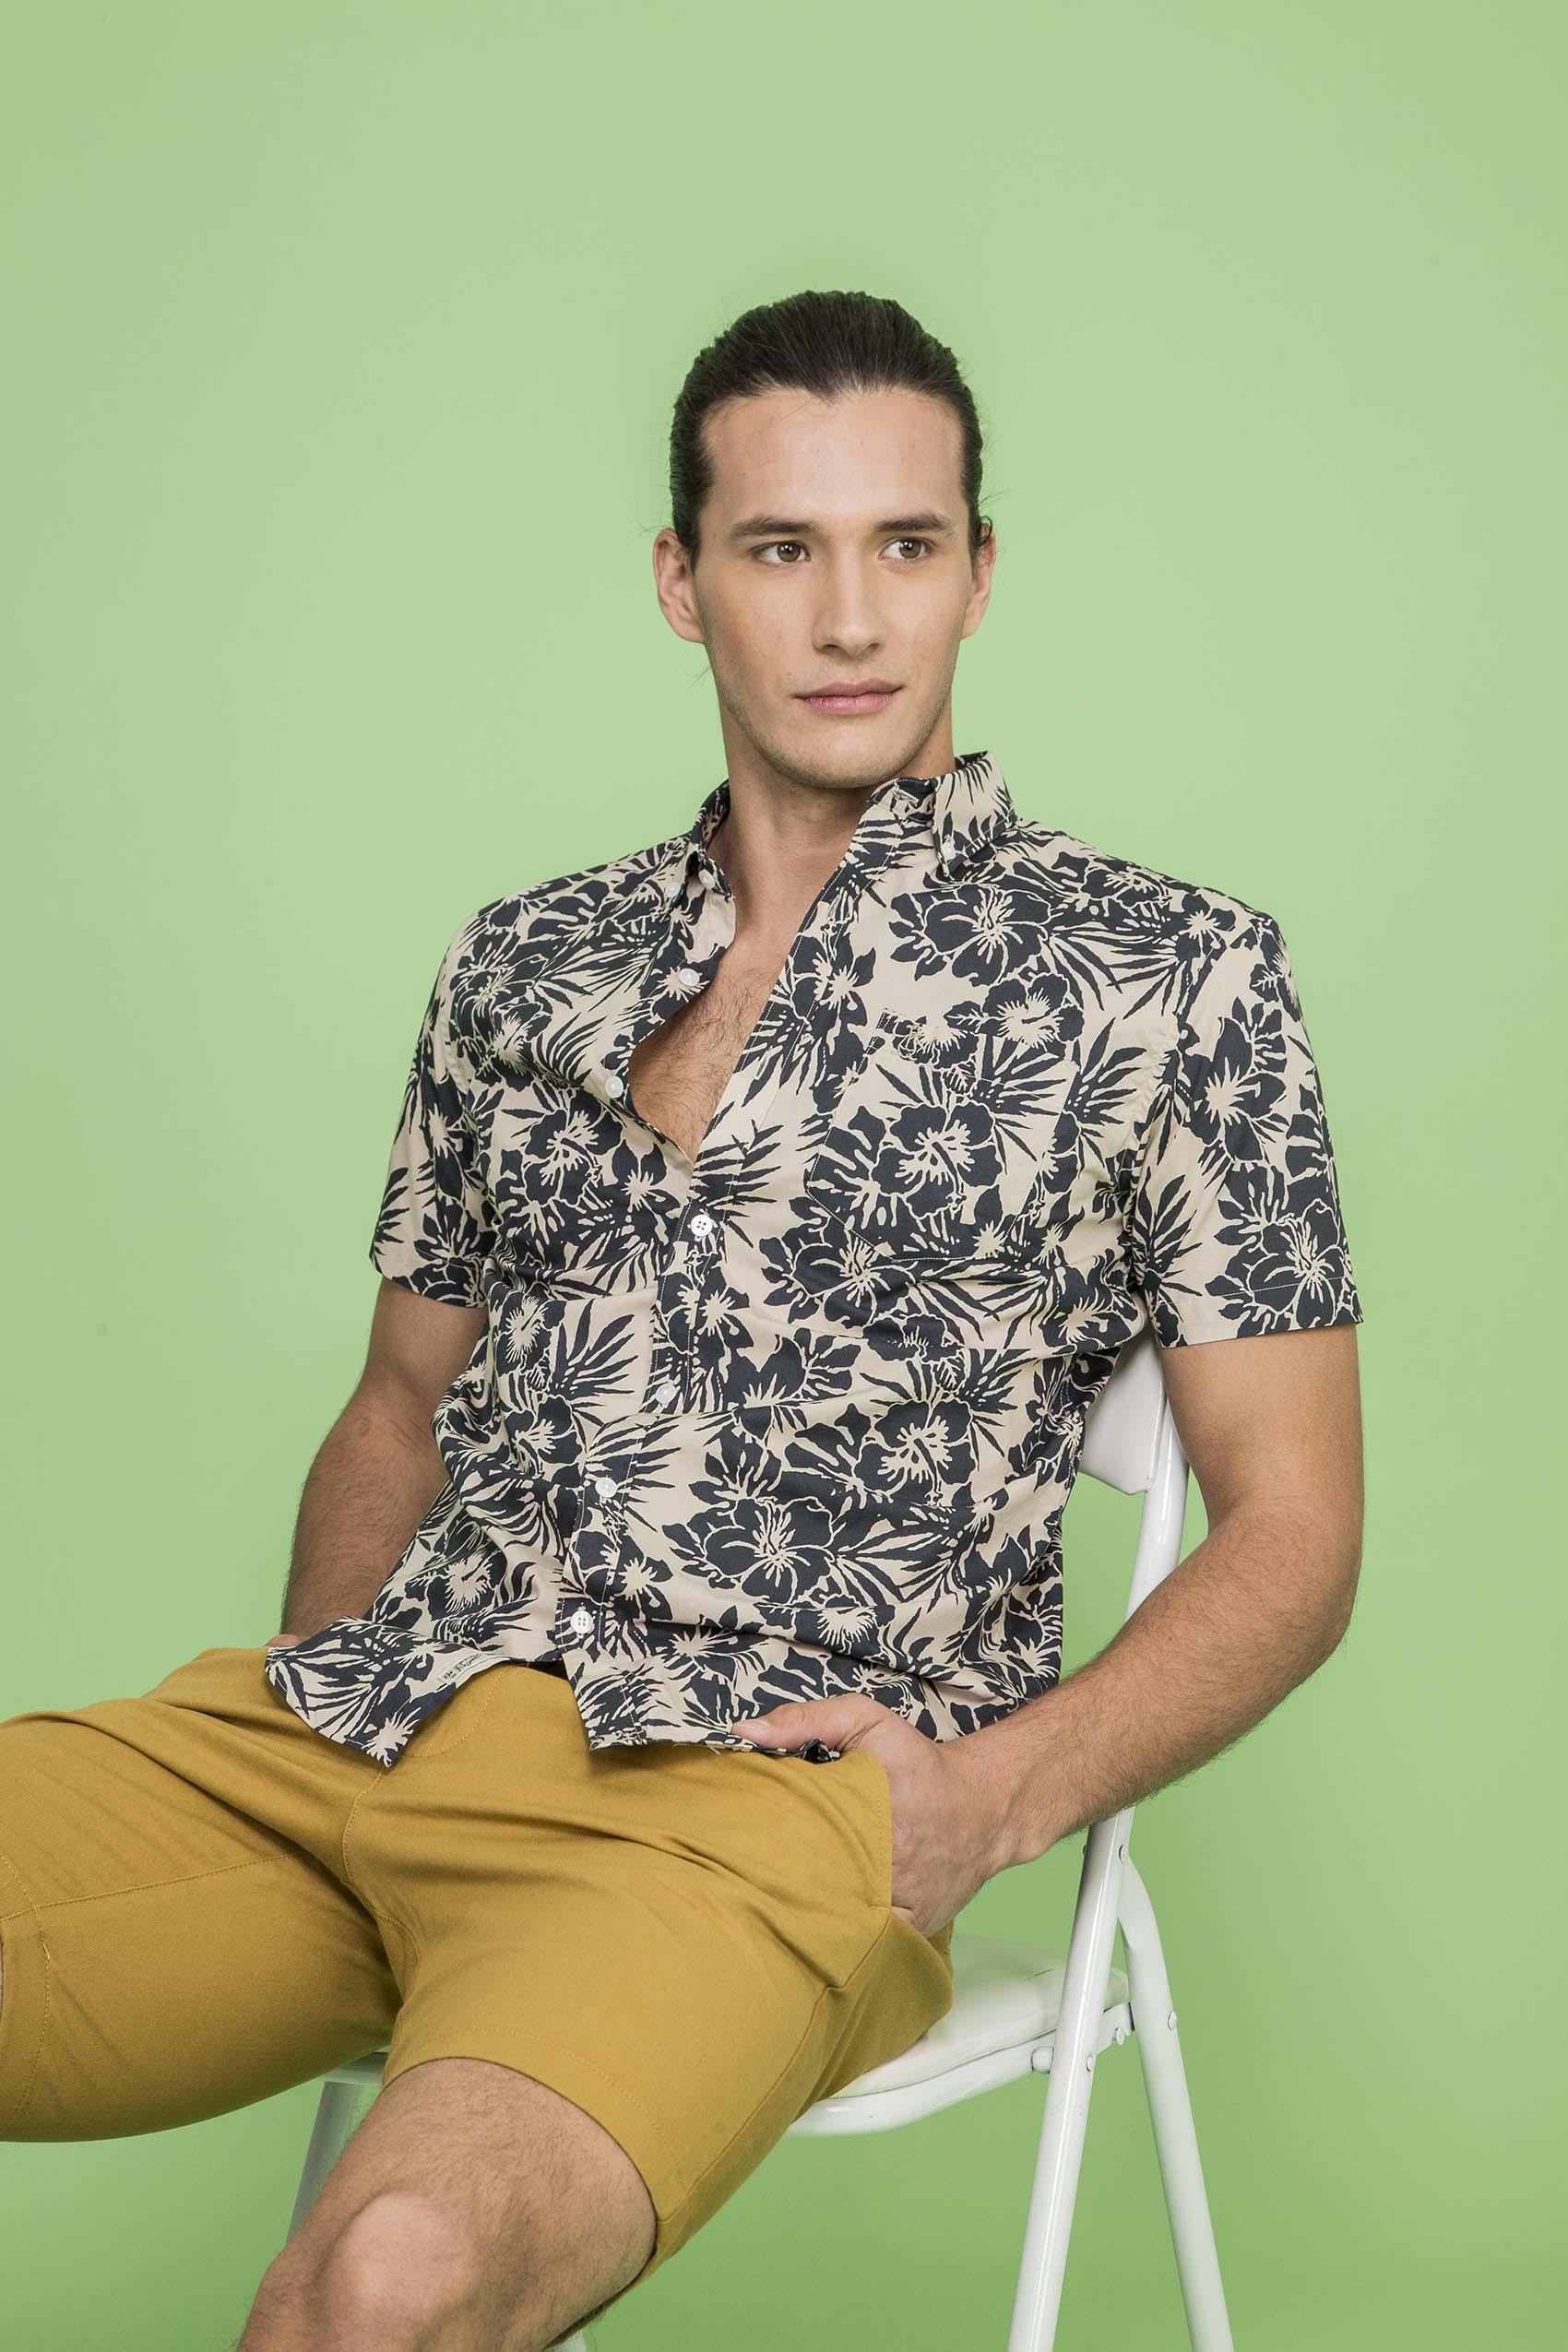 penguin_ss-surf-flower-print-shirt_45-14-2021__picture-16797